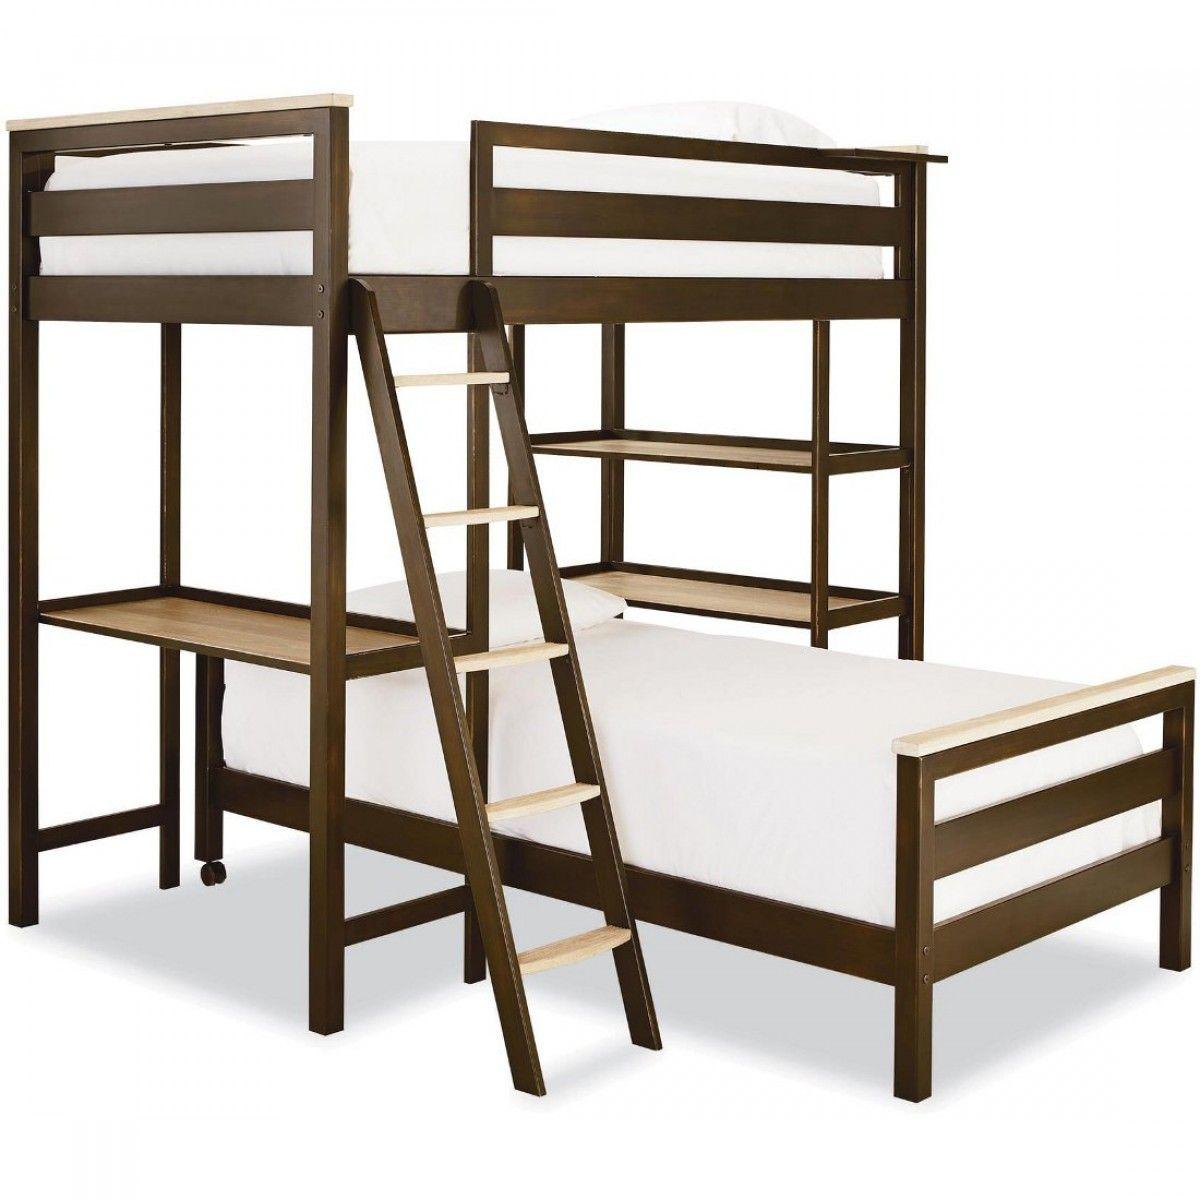 Universal Furniture Smartstuff myRoom Bunk Bed, Twin/twin